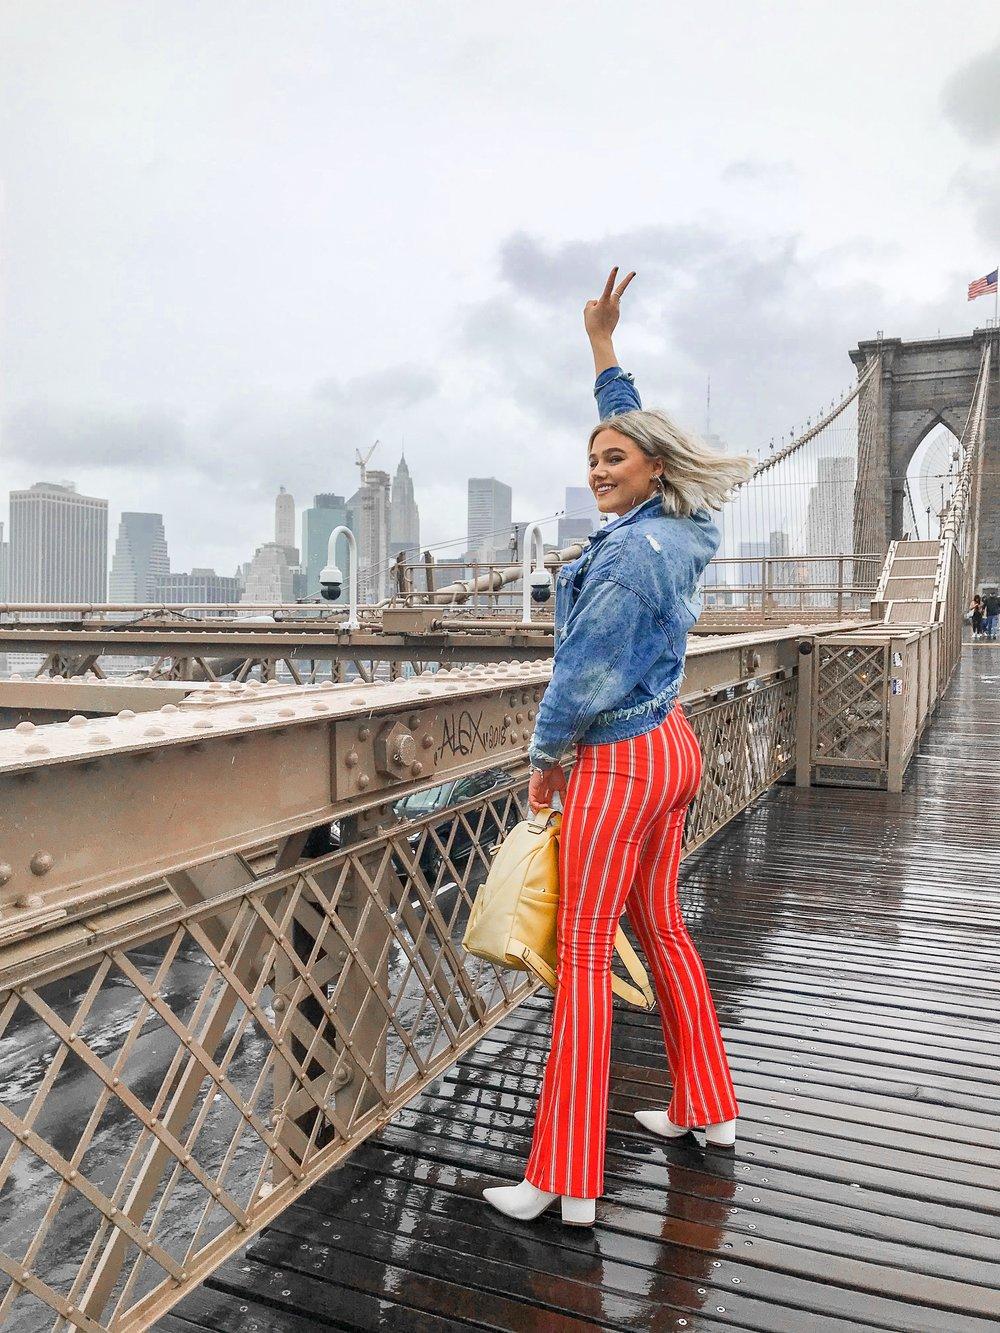 Bre Sheppard - My First NYFW - Brooklyn Bride - TopShop Pants.JPG